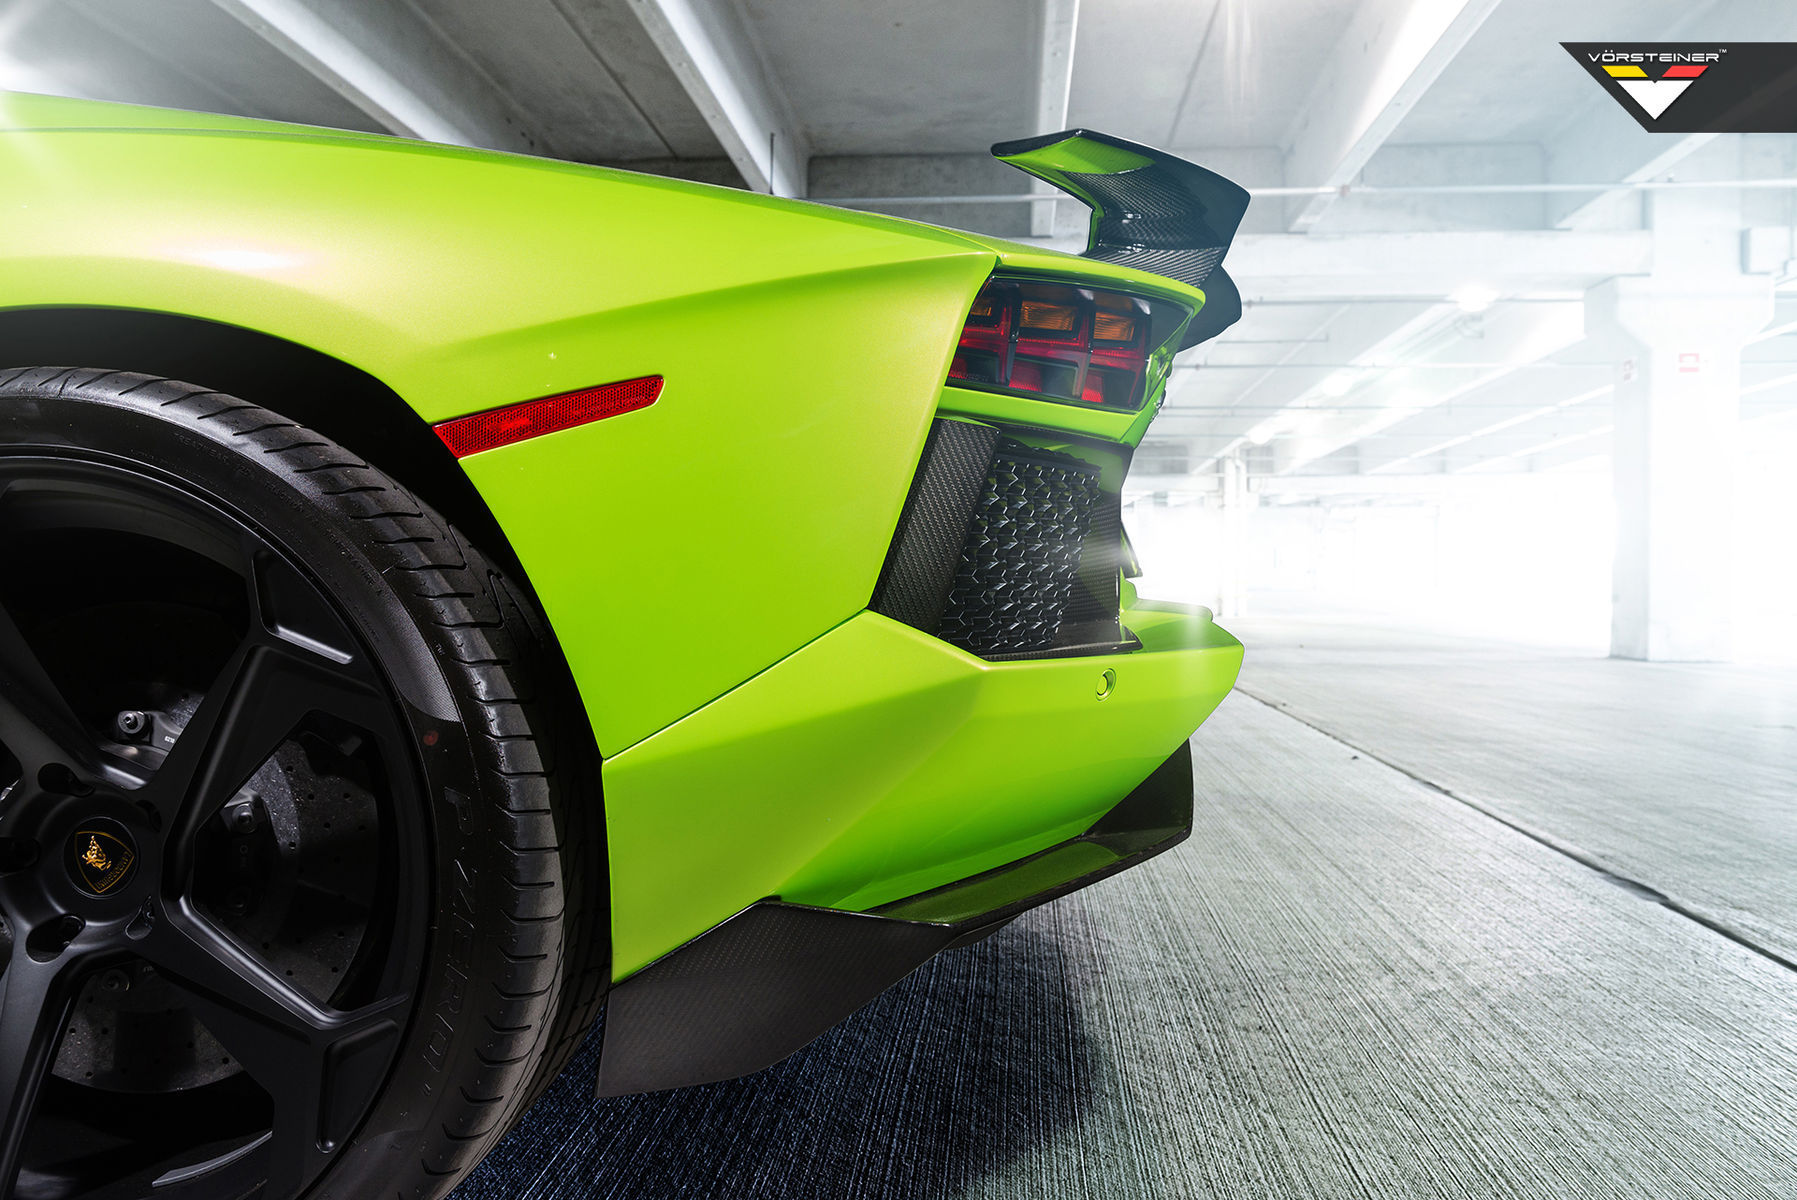 2013 Lamborghini Aventador | Vorsteiner AVENTADOR-V for the Coupe / Roadster